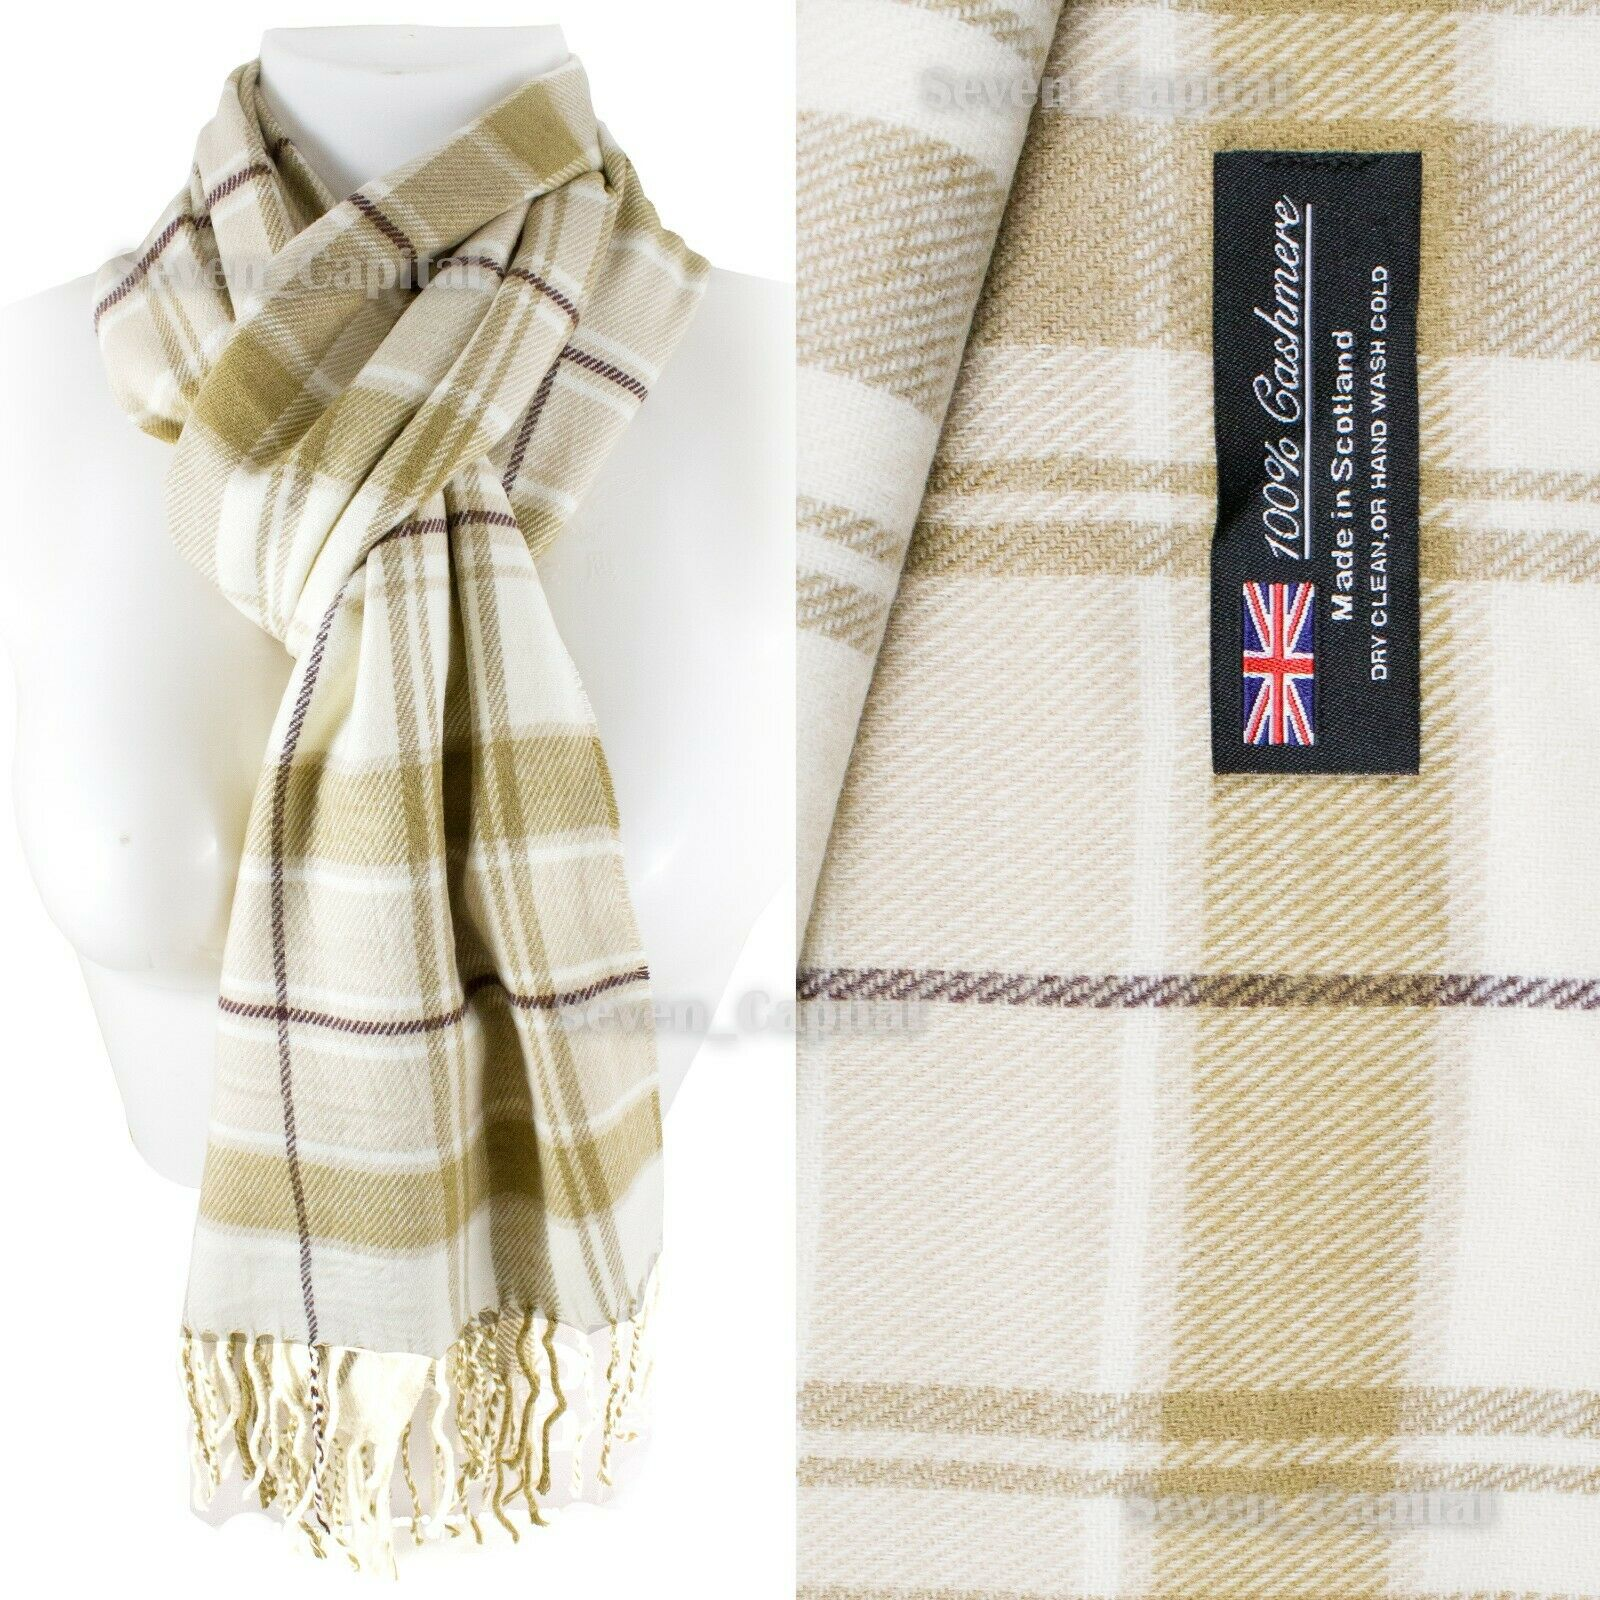 Mens Womens Winter Warm SCOTLAND Made 100% CASHMERE Scarf Scarves Plaid Wool 28. Plaid: Beige/White